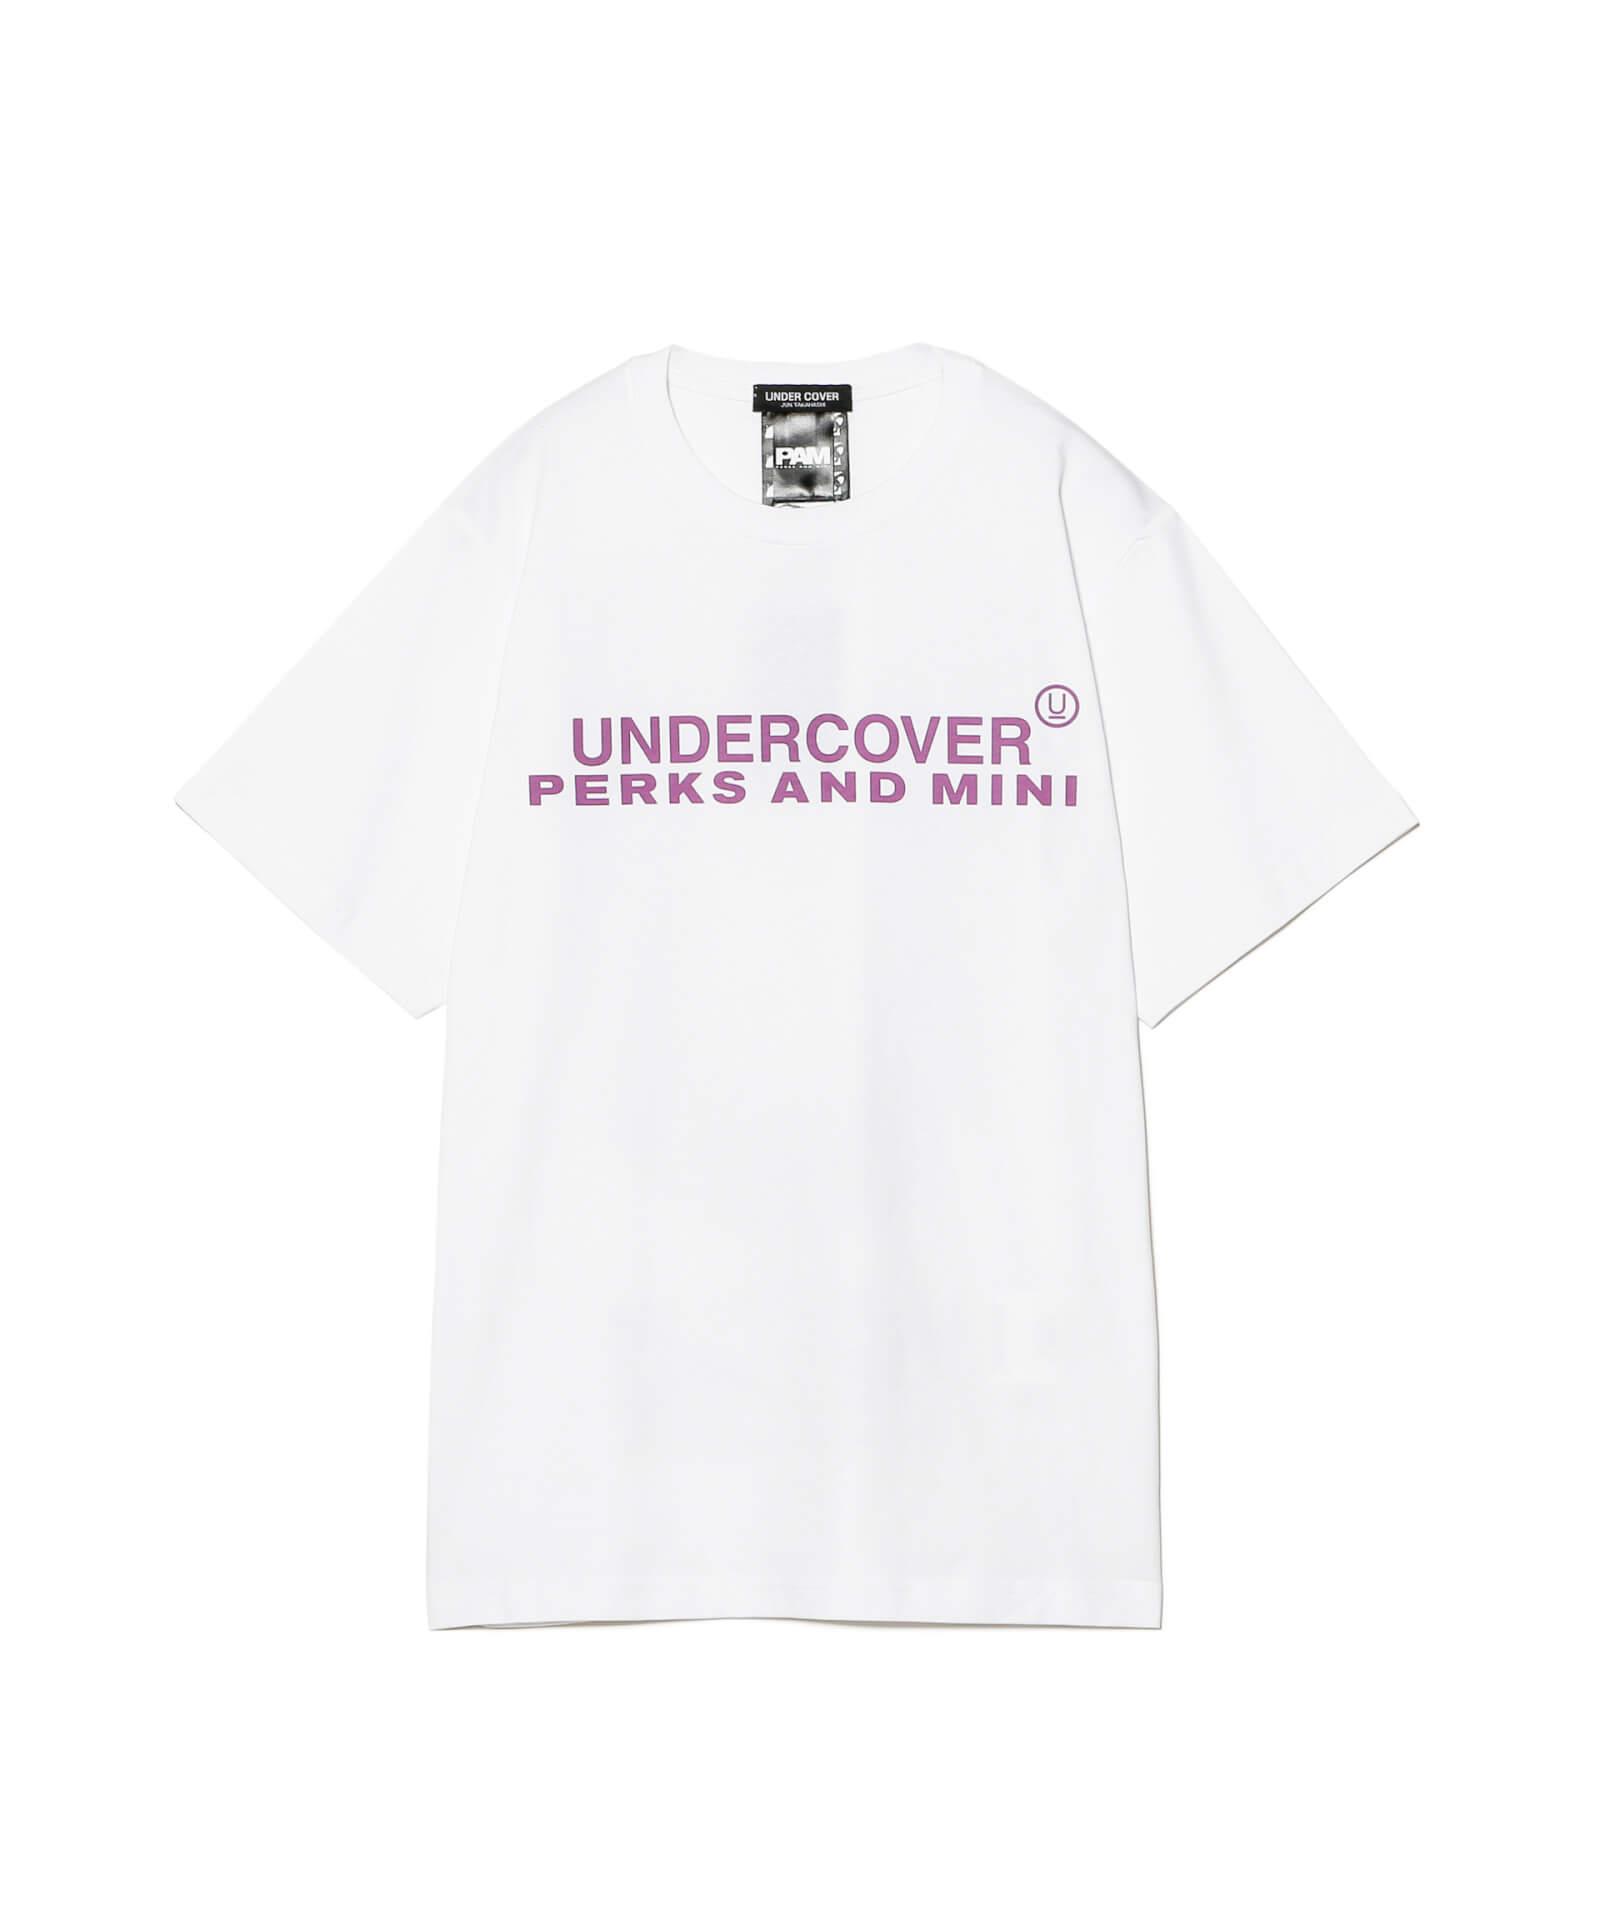 UNDERCOVER、P.A.M.、MEDICOM TOYのコラボ『スカル&ハンドランプ』が登場!限定コラボTシャツ&スウェットも lf200925_undercover_pam_15